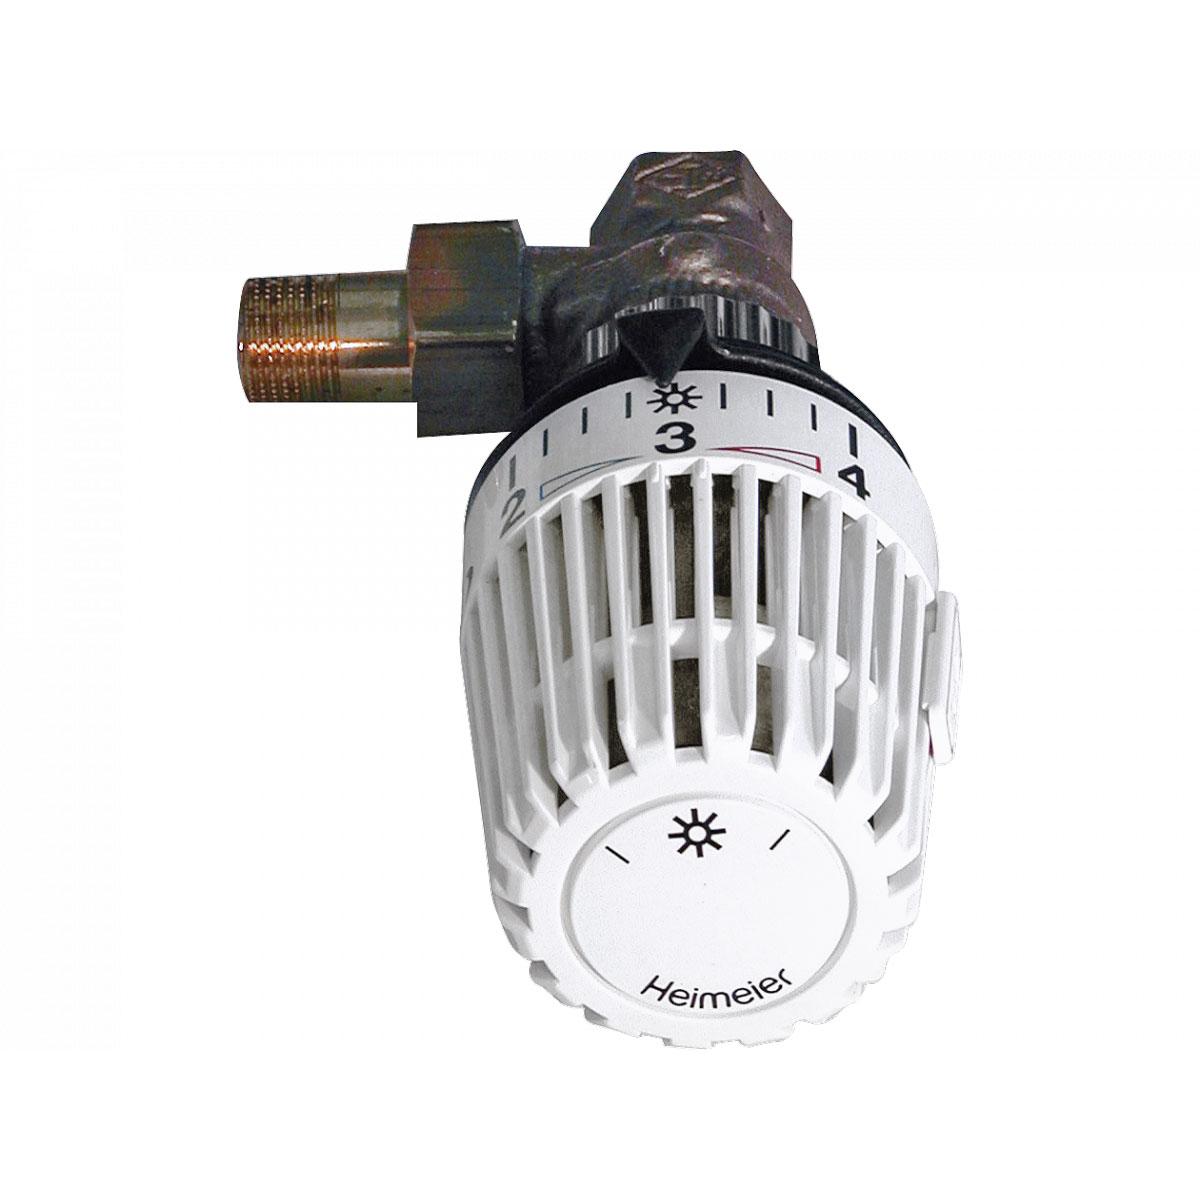 Sollwert 40-70°C Heimeier RTL Thermostat-Kopf für TA-Multi